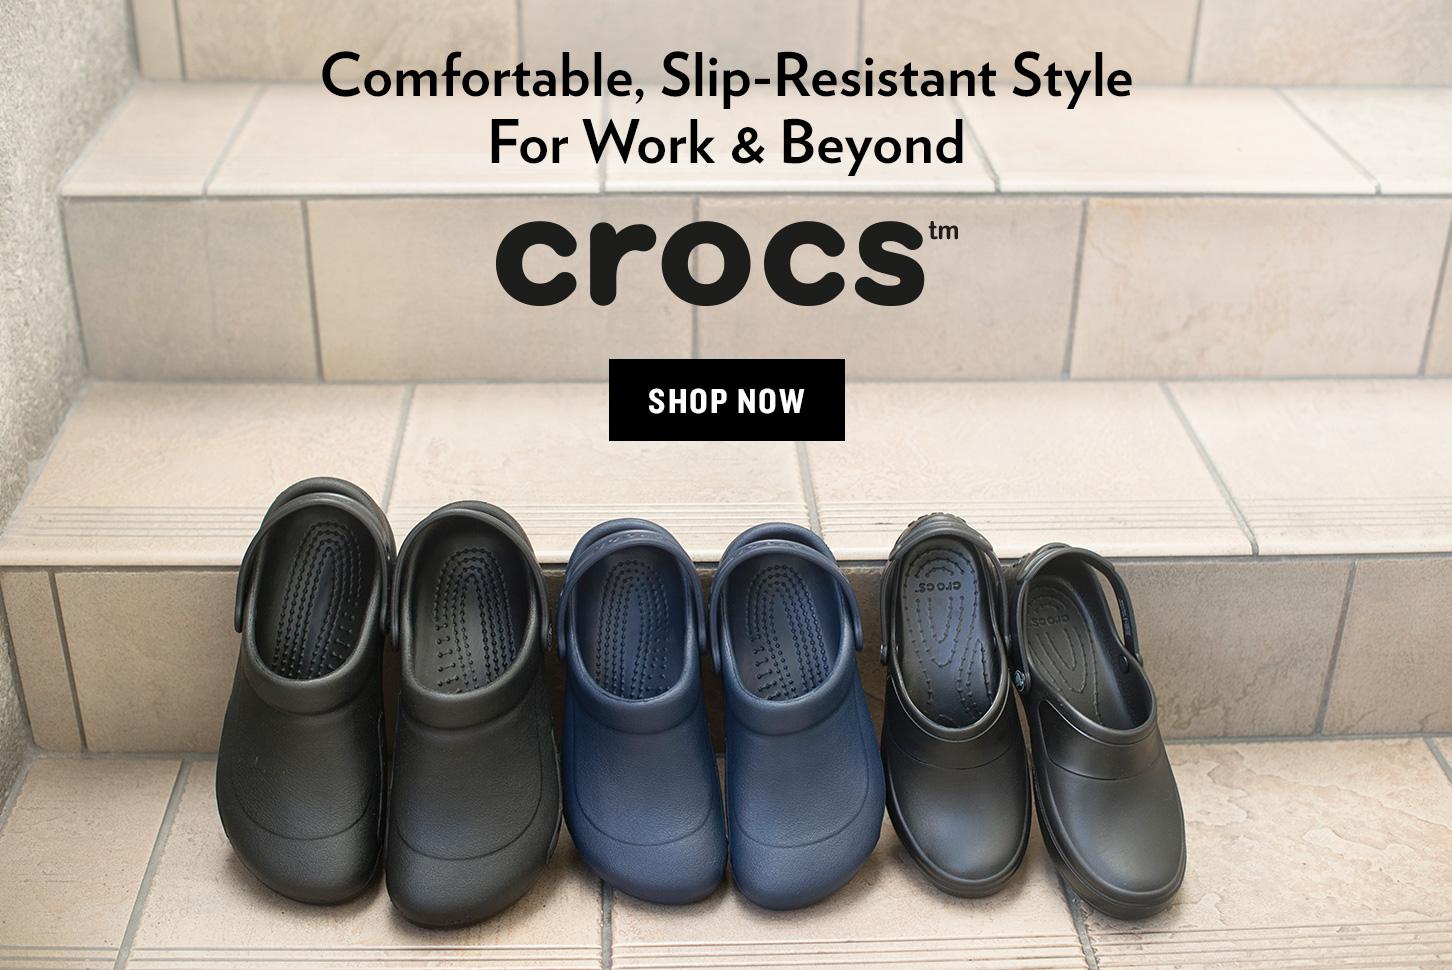 Black and Blue Crocs